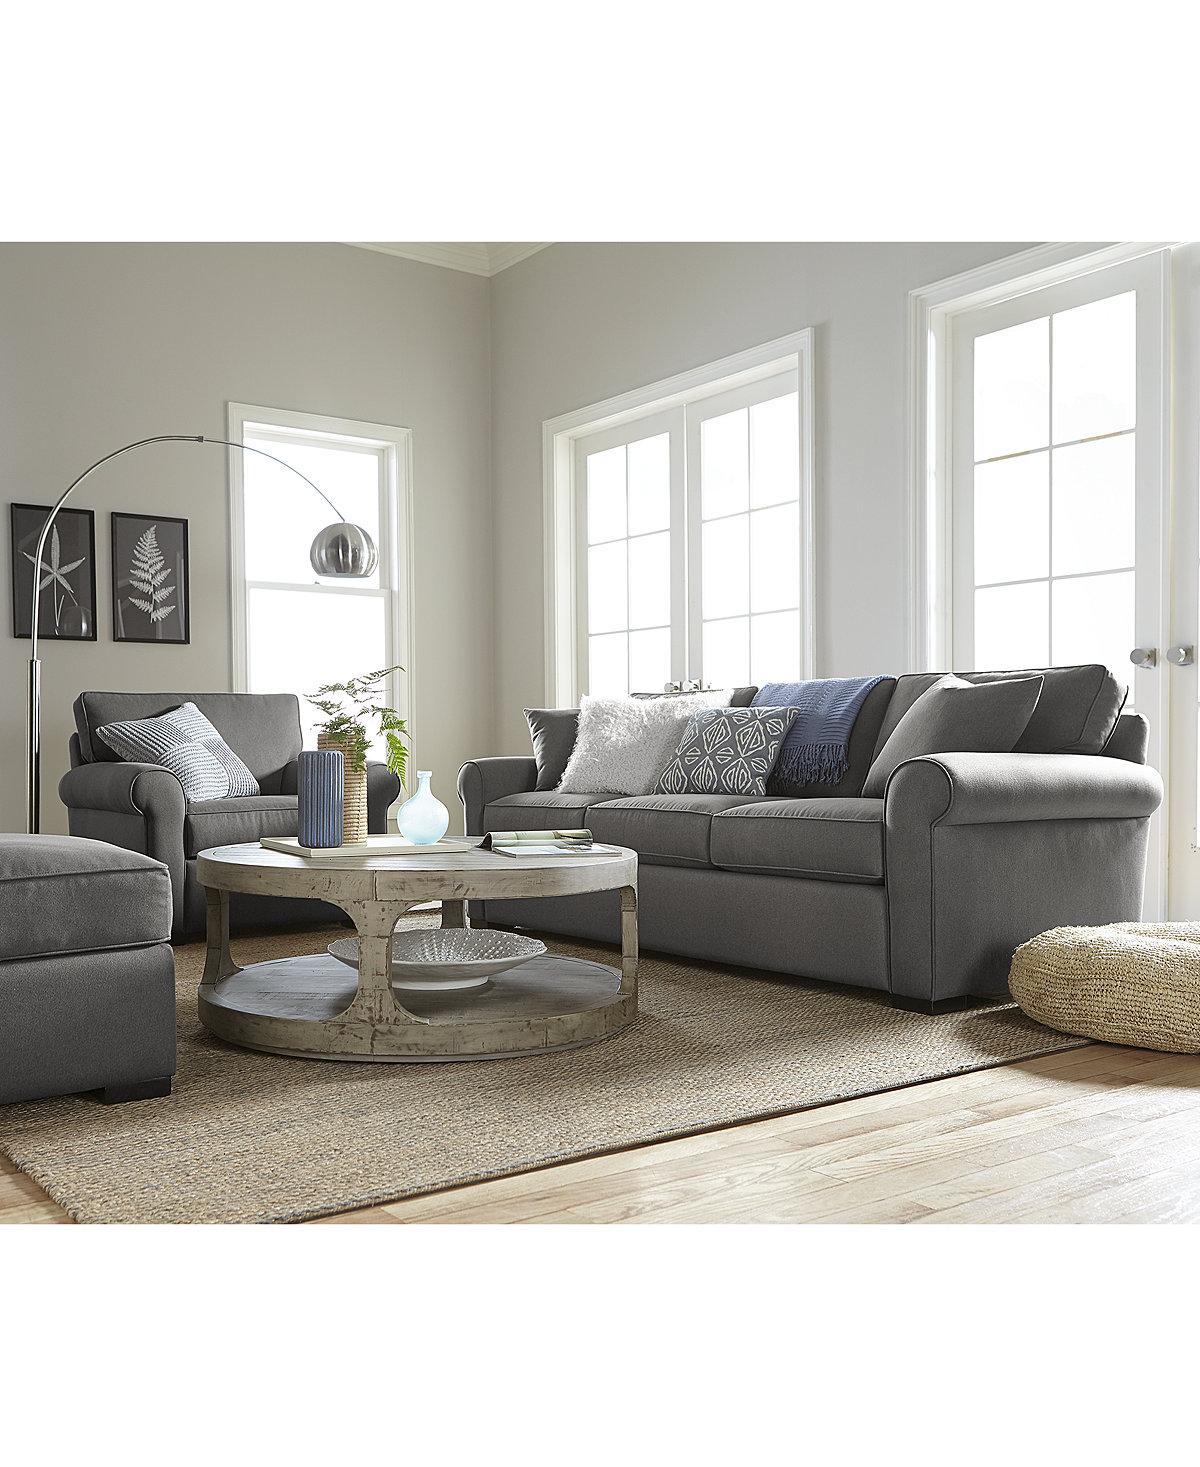 $599 Astra Fabric Sofa, Created For Macy's